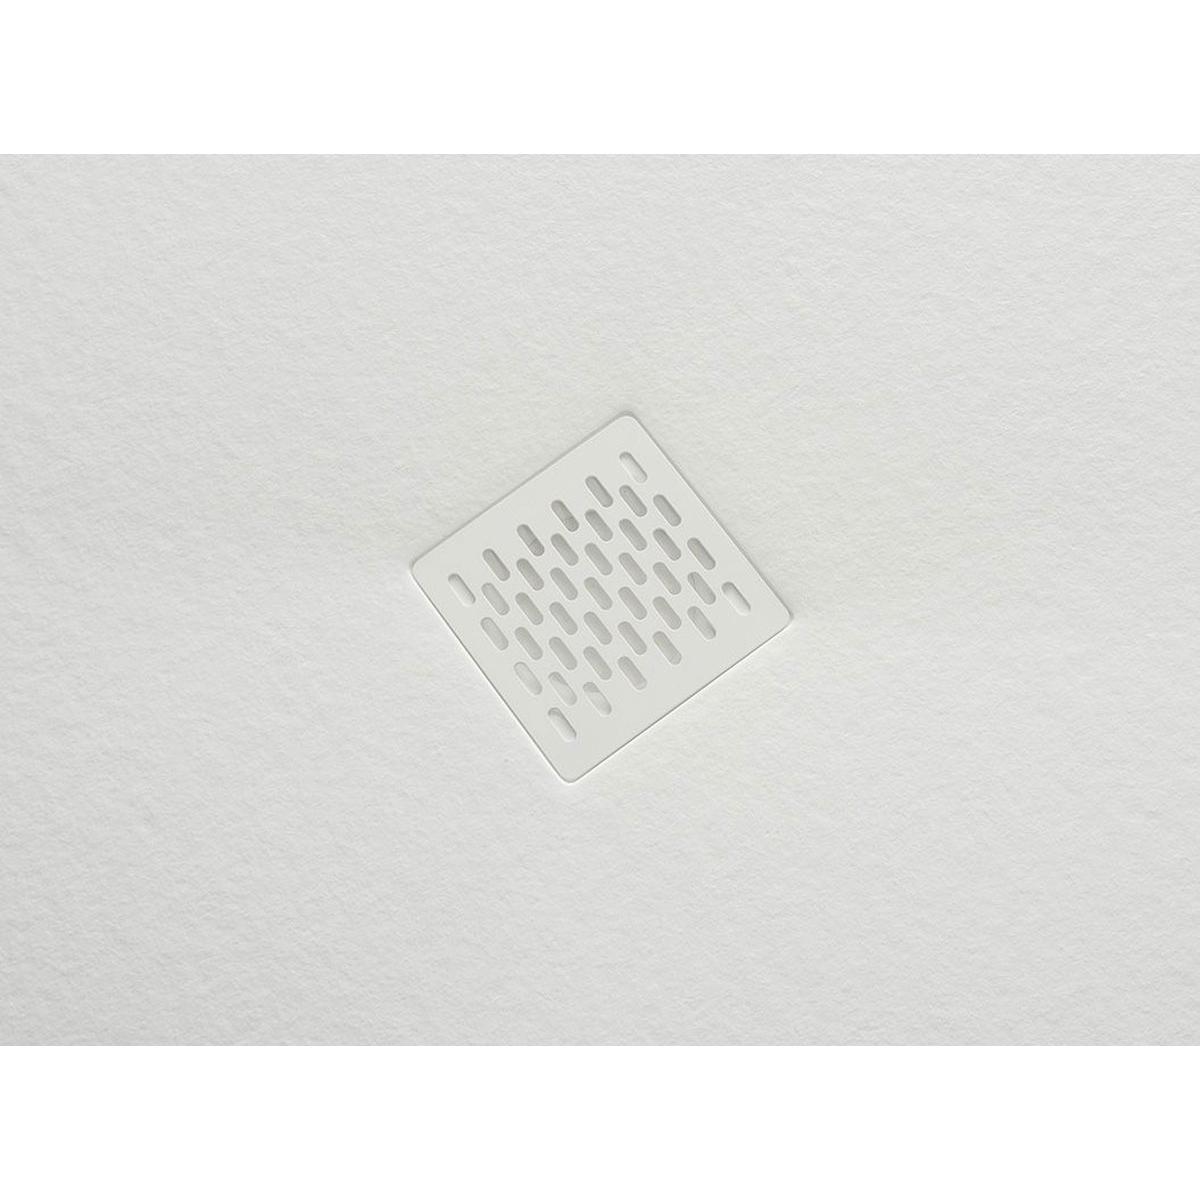 Plato de ducha rectangular 100x80 Coliseo Stone Nox Blanco